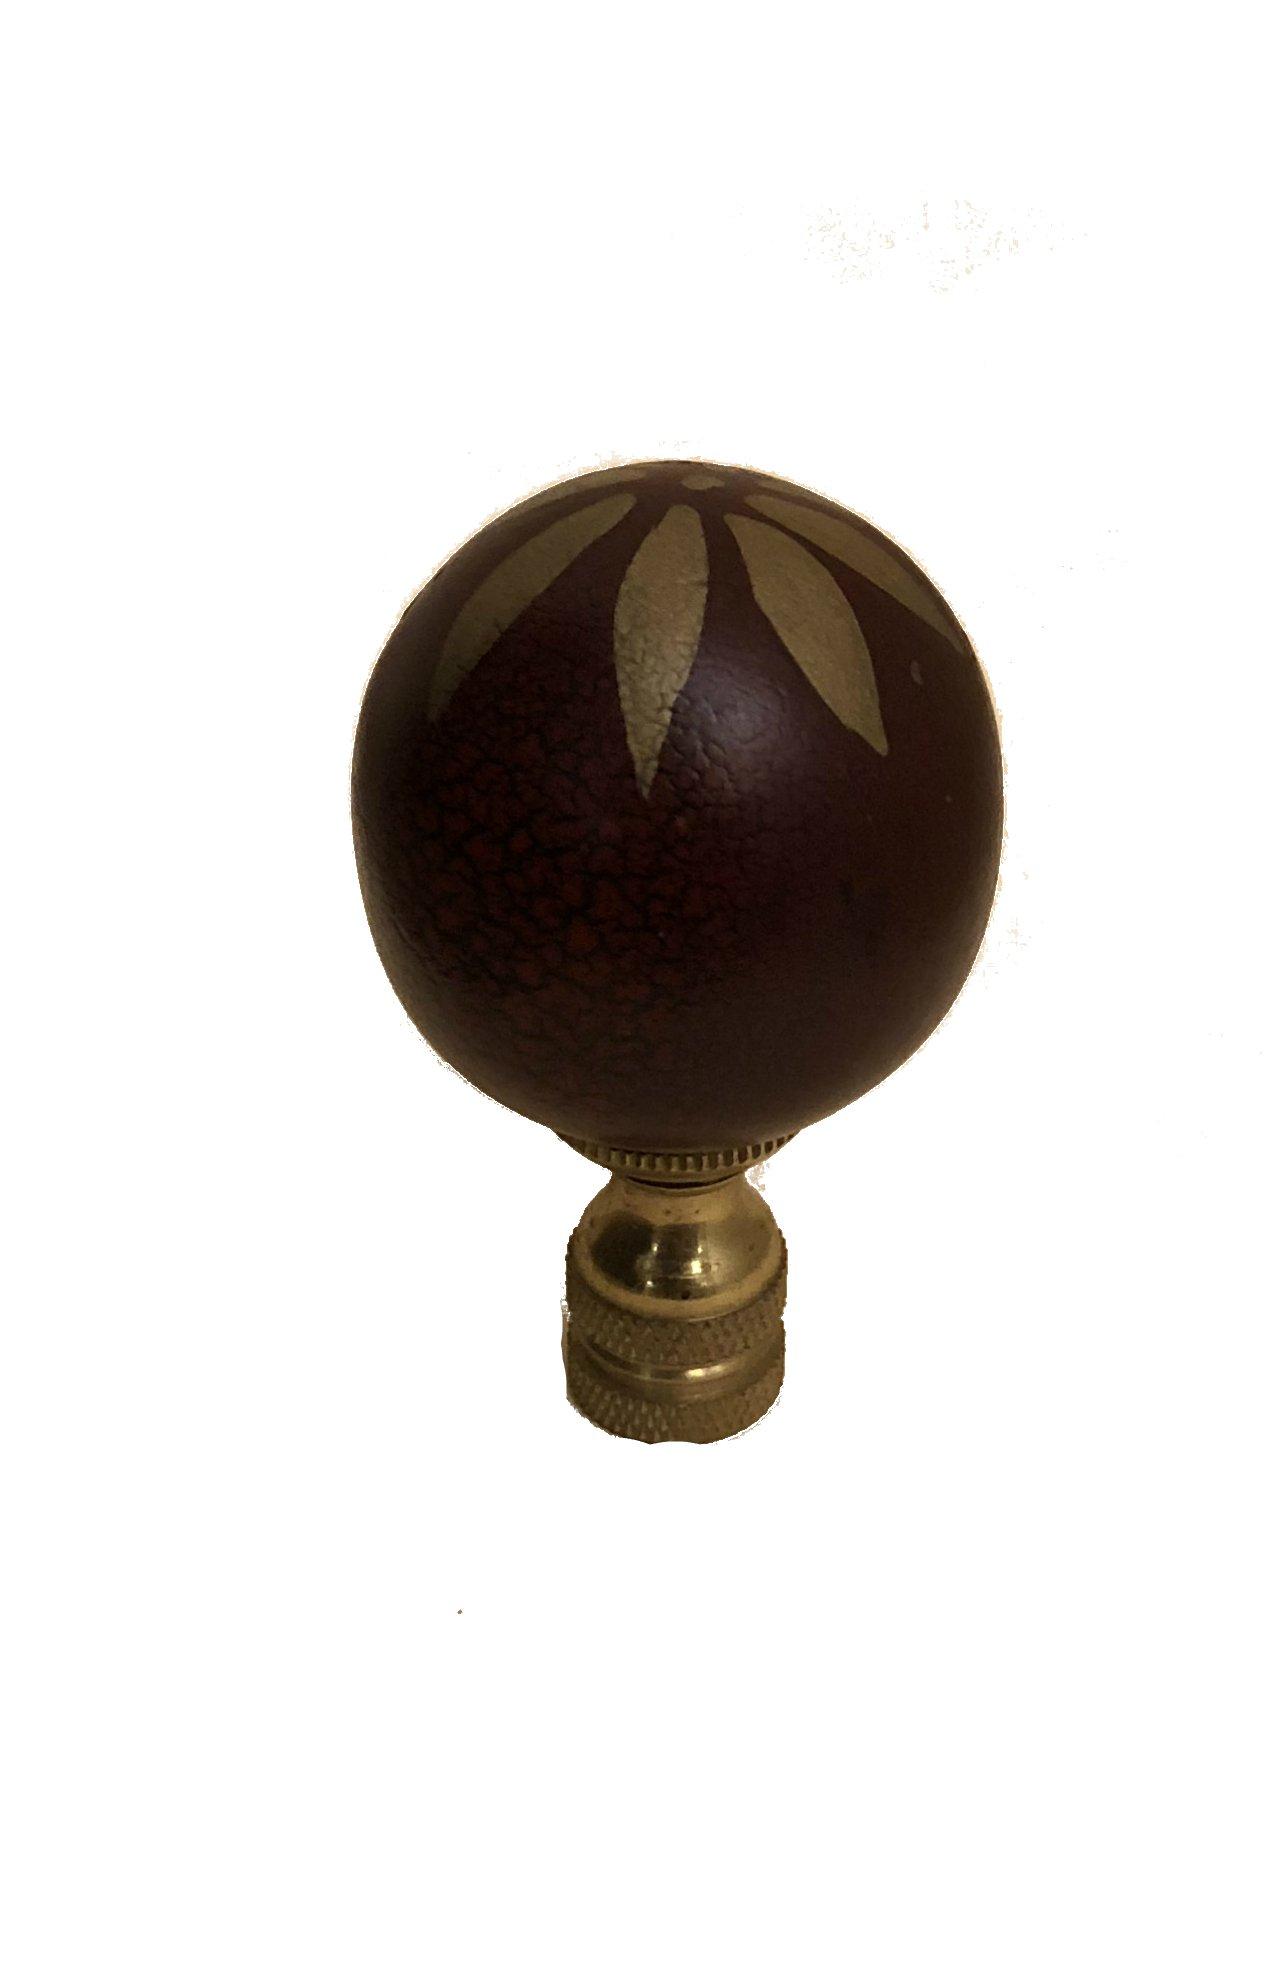 Bethesda Design, LLC Red Pomegranate Finial Faux Cinnabar Lamp Shade Topper Red Wood Ball 2.25'' Tall